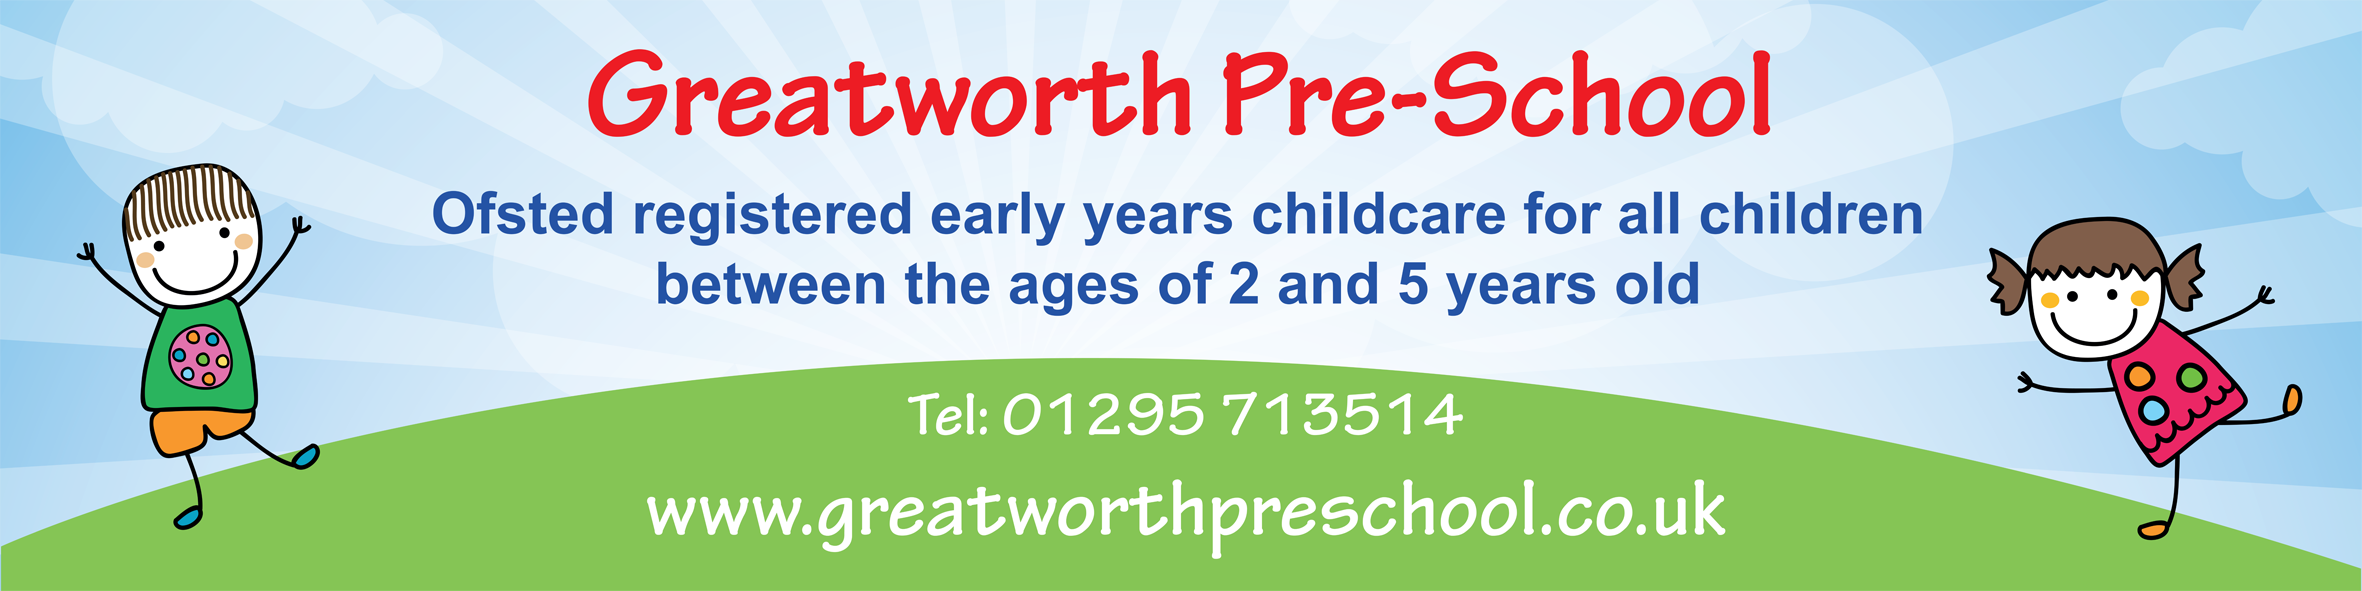 Banner Promotional Design Website Branding Greatworth PreSchool